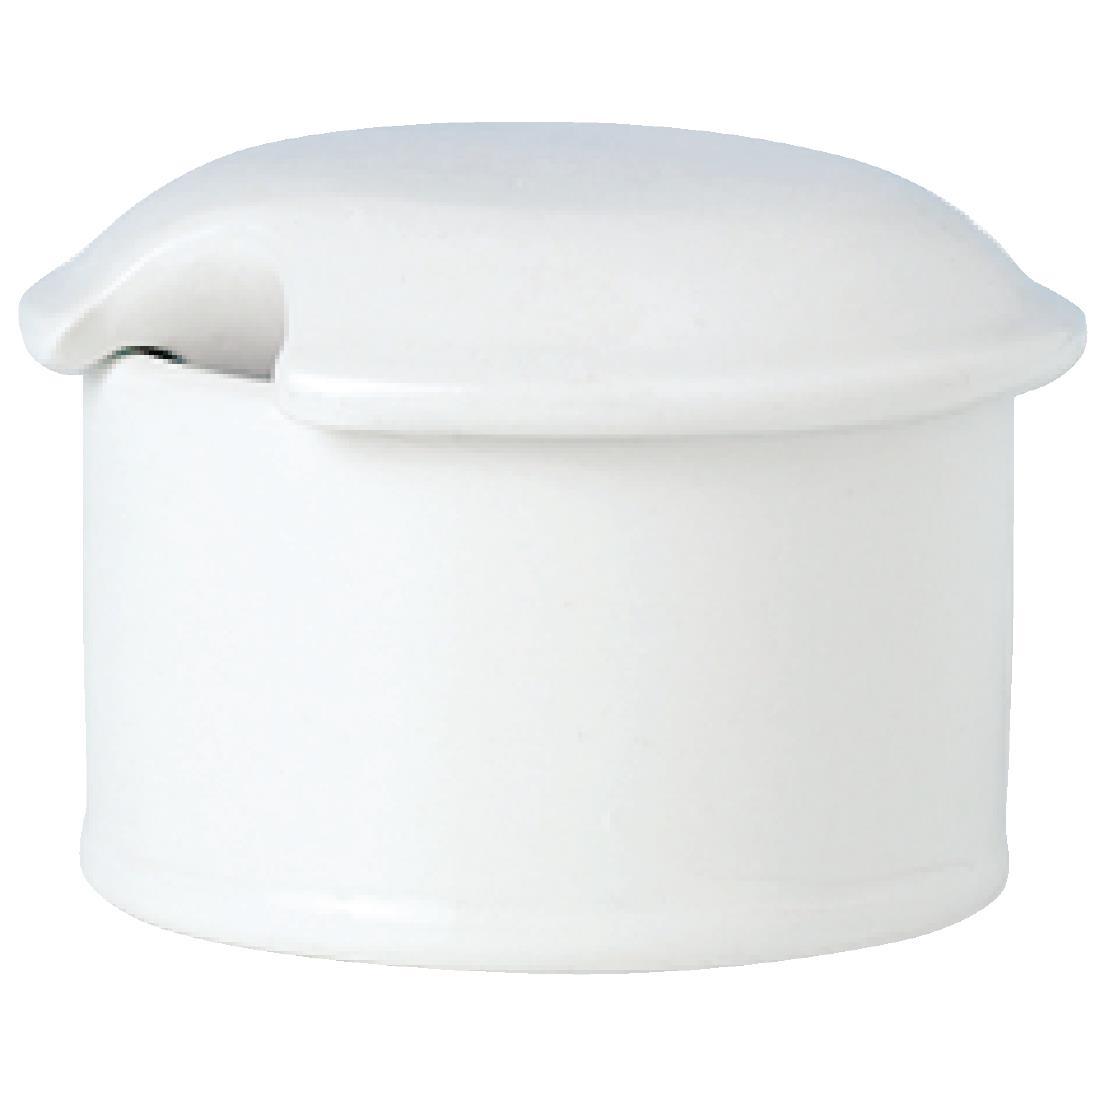 Steelite Simplicity White Mustard Dipper Lids (Pack of 12) (V9469)